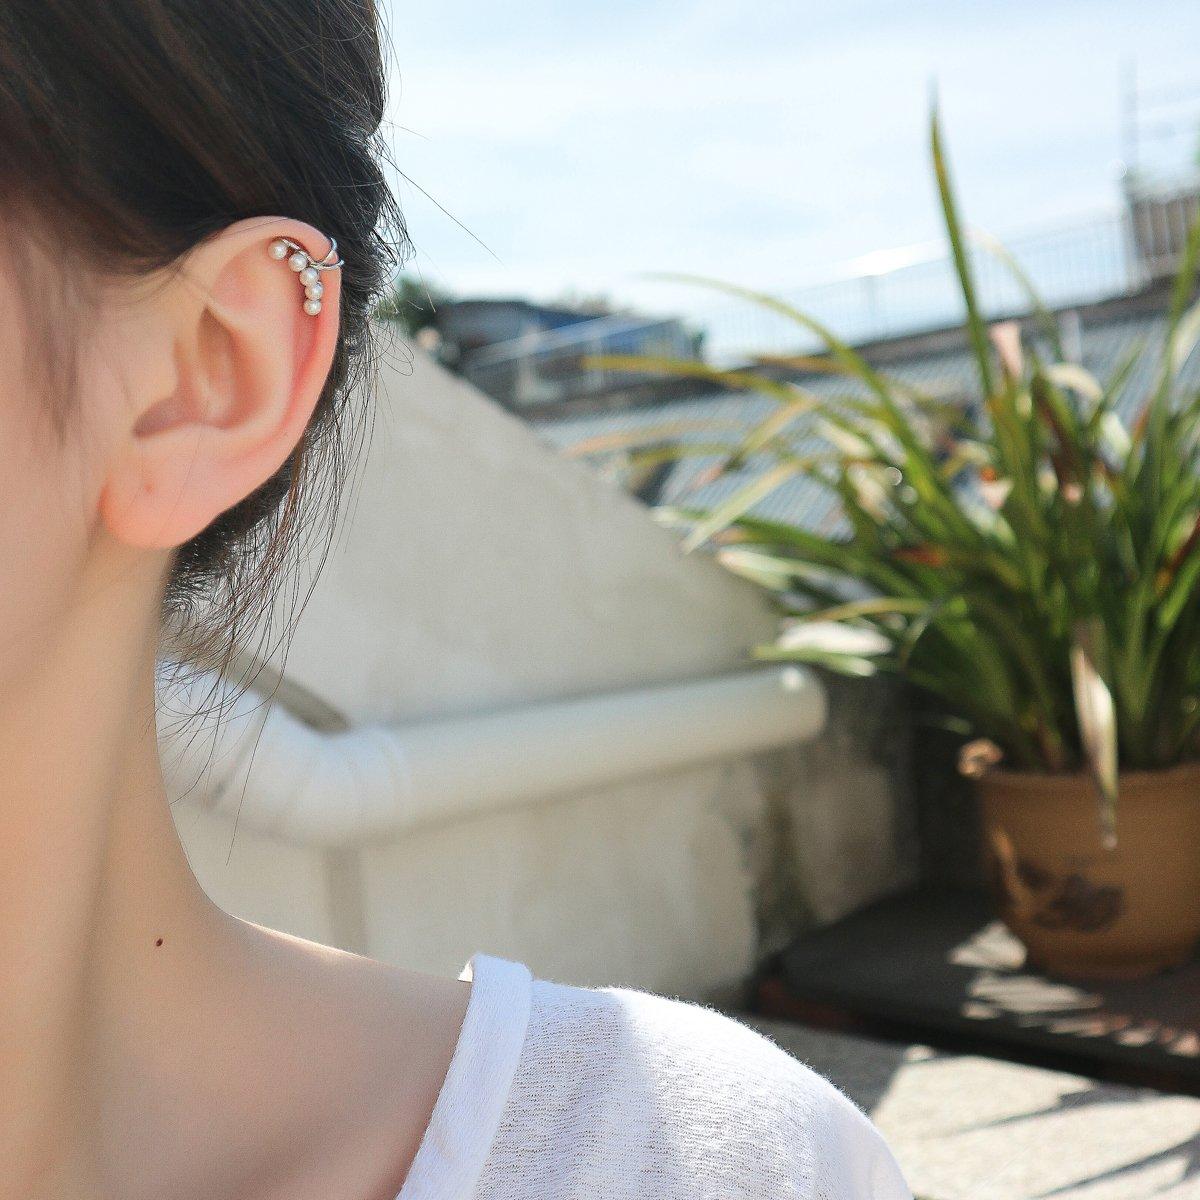 Aifeer Sterling Silver Non Pierced Ear Stud Earrings 5 Pearls Wrap Cuff Clip On Ear Clamp (A Pair) by Aifeer (Image #3)